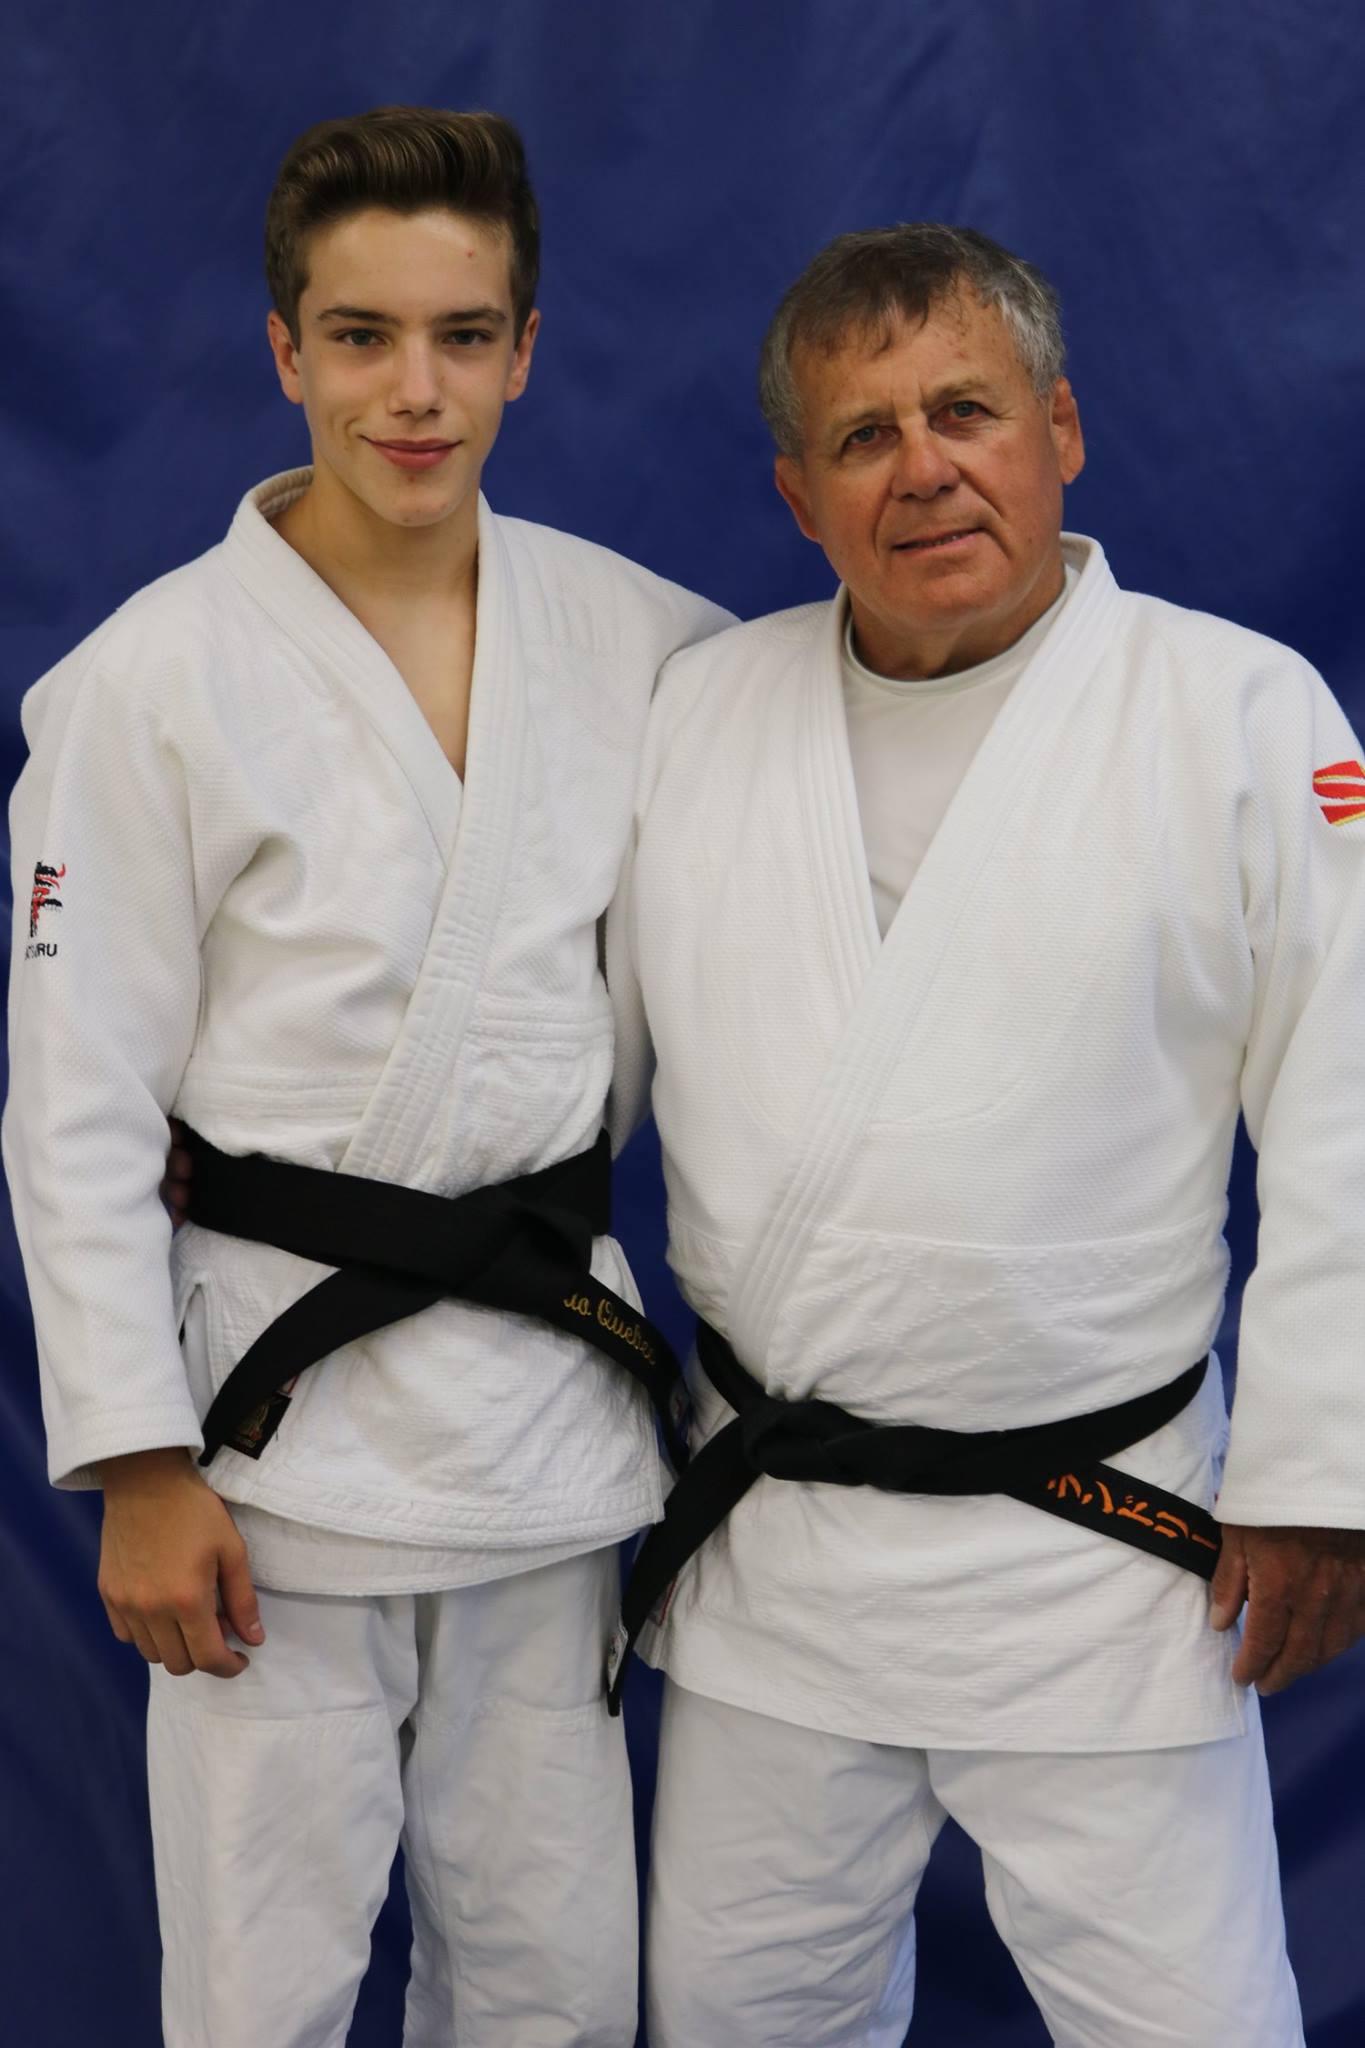 Justin Tremblay et Sensei Yves Landry